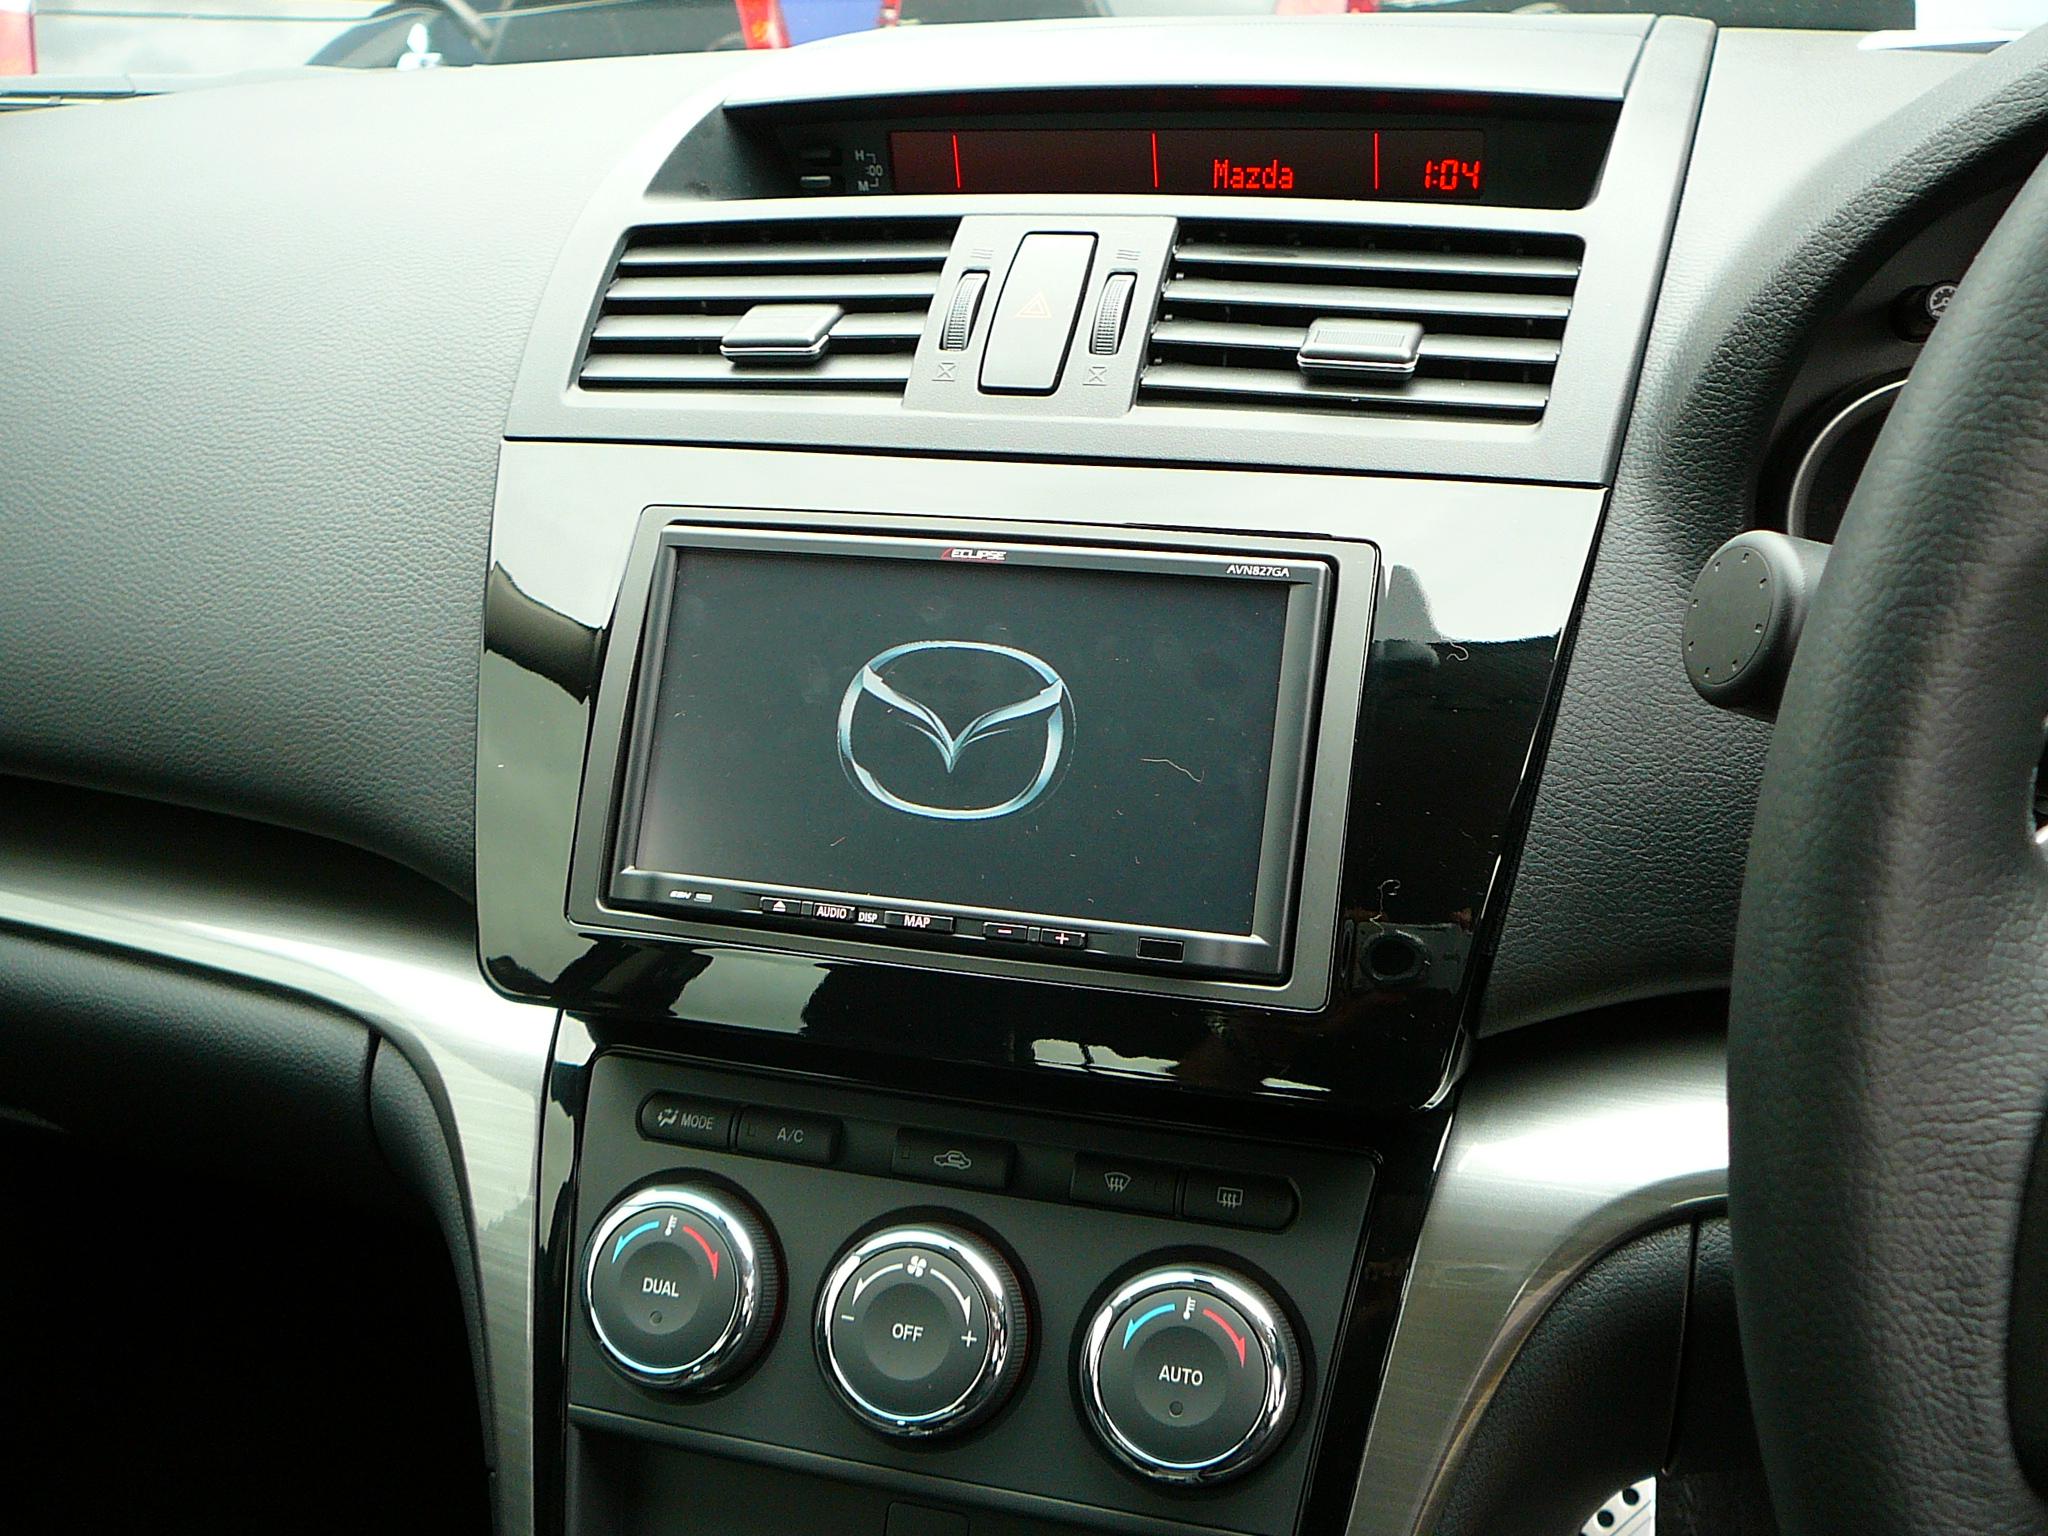 2011 mazda 3 navigation system update